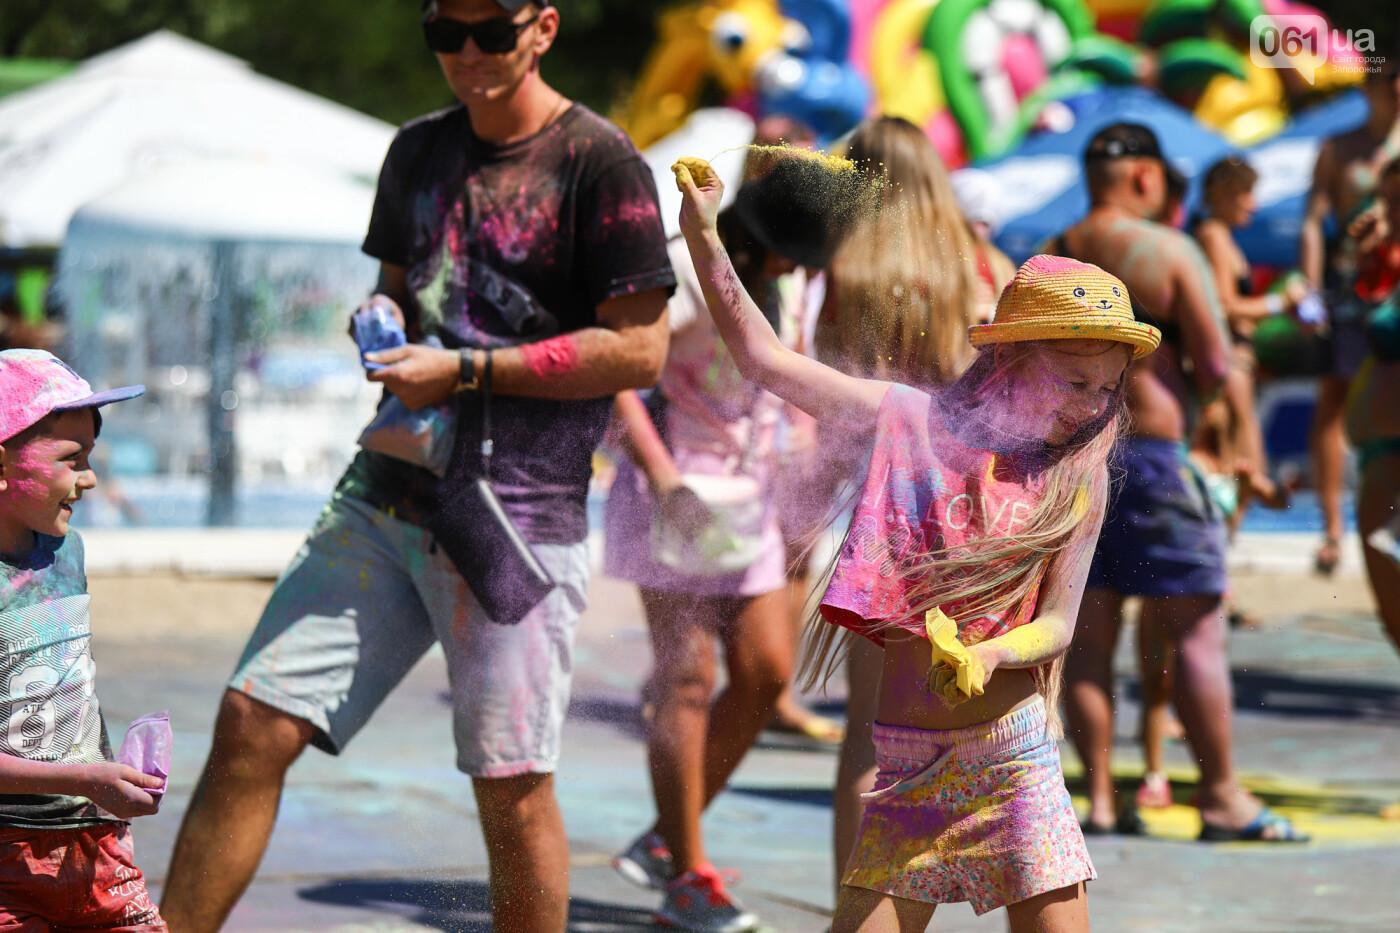 Сотни запорожцев приняли участие в фестивале красок Холи, - ФОТОРЕПОРТАЖ, фото-2